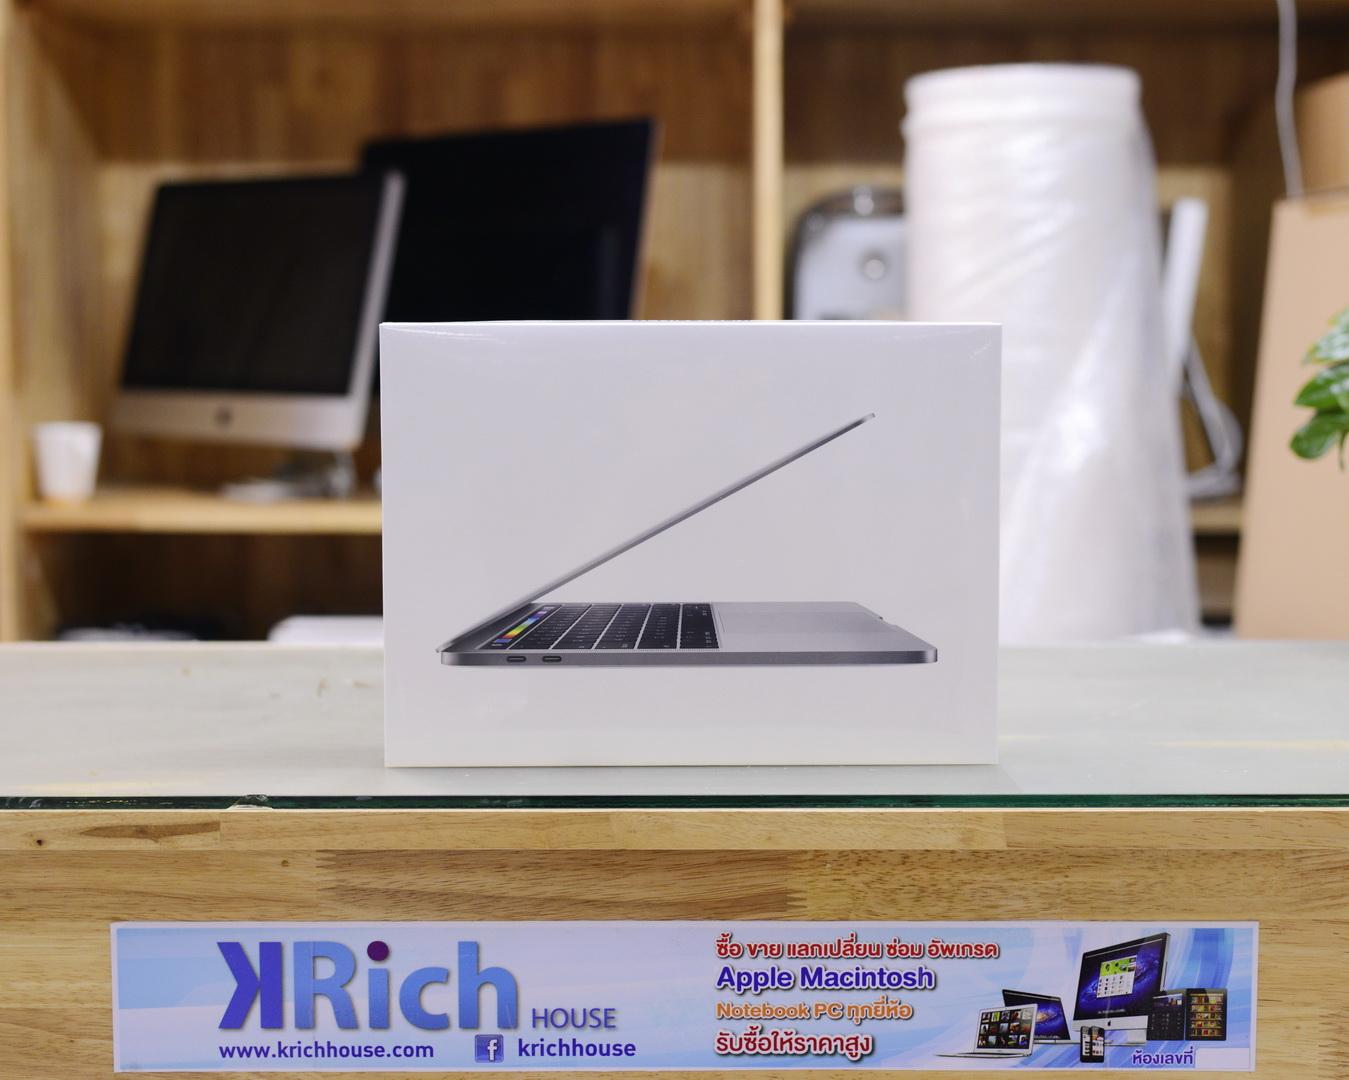 NEW - TOP MODEL MacBook Pro (13-inch, 2017) Touch Bar, Space Gray - Core i5 3.1GHz RAM 8GB SSD 512GB Apple Warranty 22-08-18